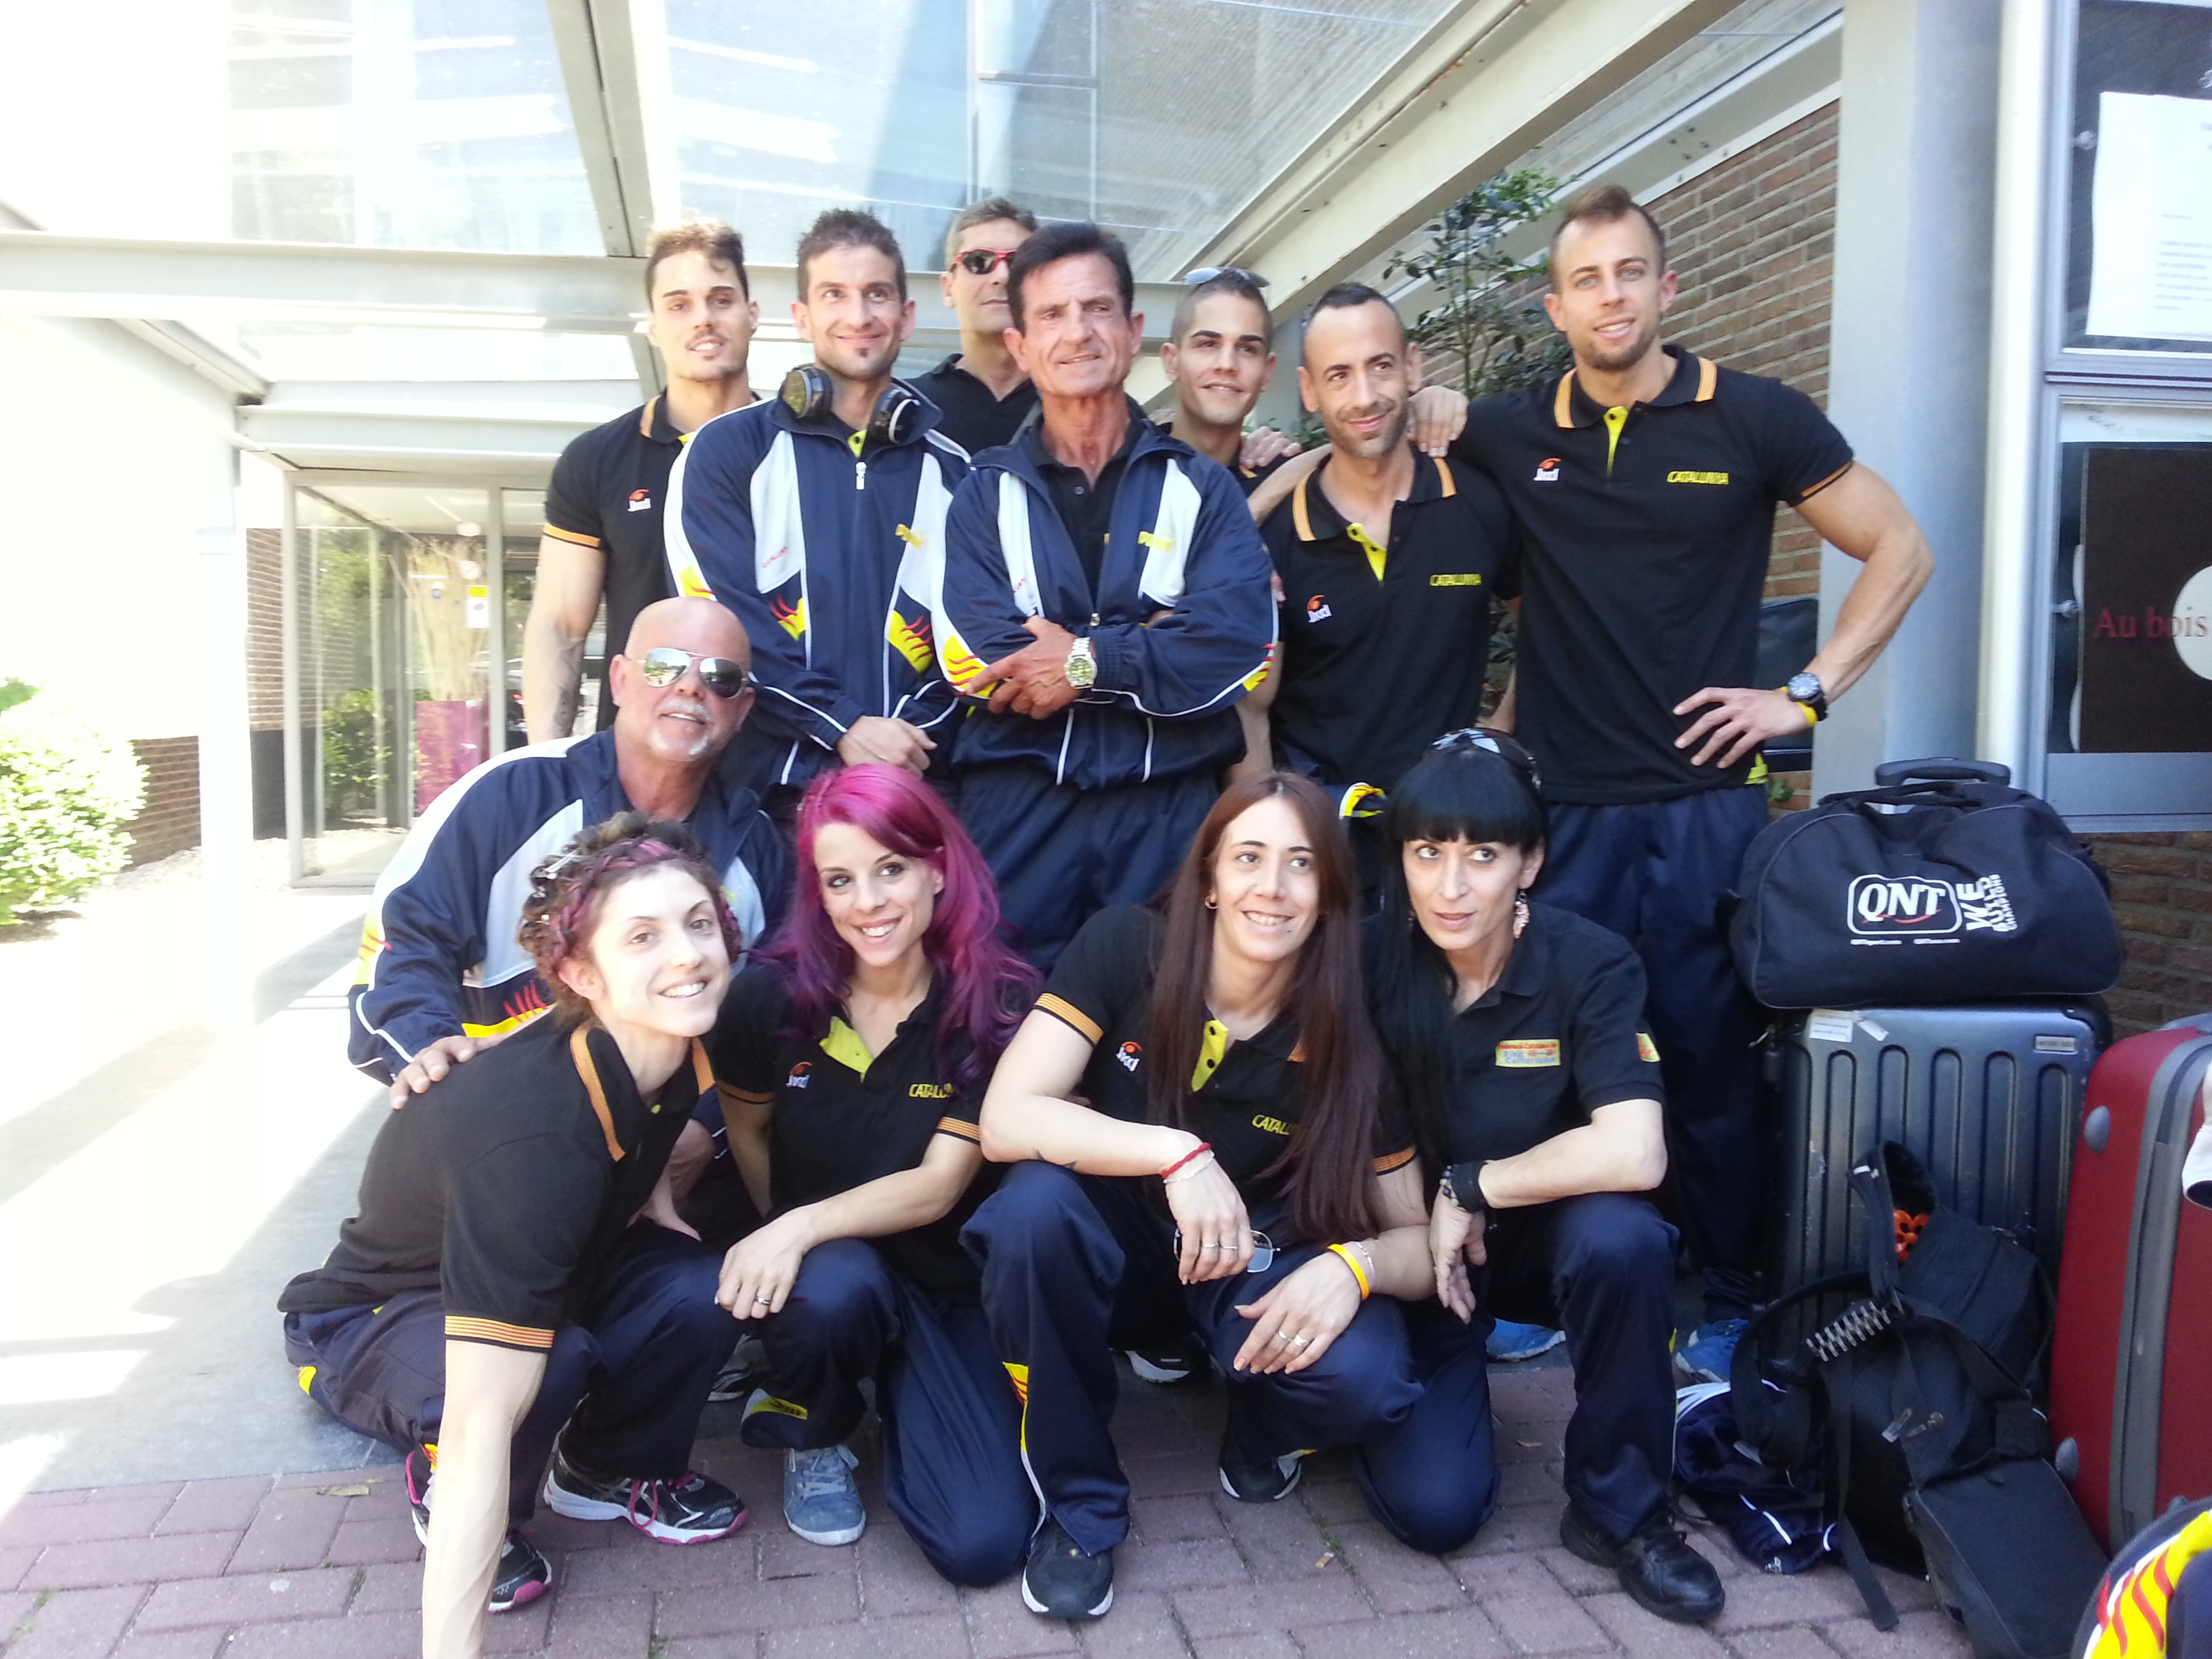 Campionat d'Europa UIBBN 2014